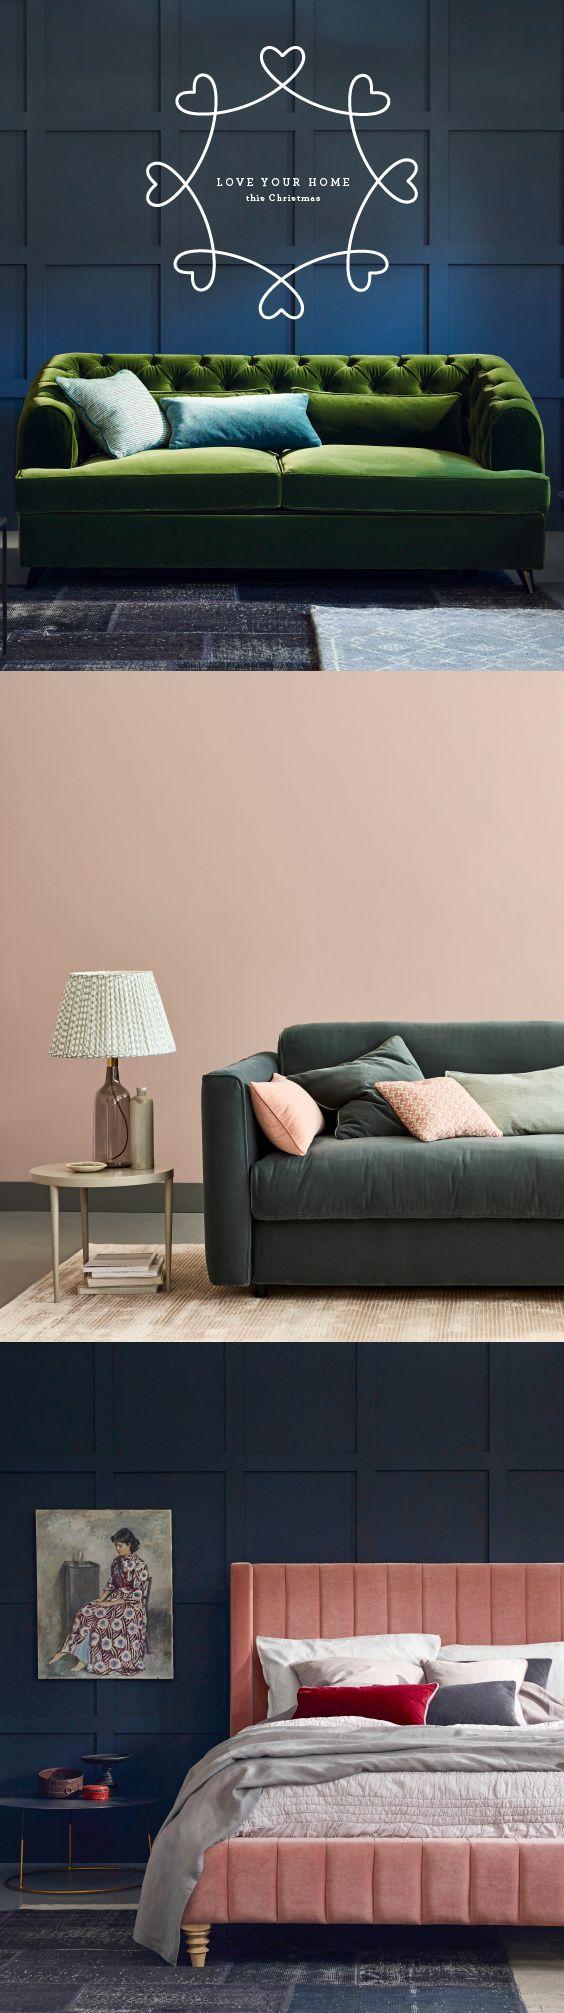 Earl grey sofa bed, frieda sofa bed, alice bed, green sofa, christmas, velvet sofa, home design ideas, interior design ideas, living room design ideas, bedroom design ideas, living room interiors, bedroom design, sofa bed, green sofa beds, pink bed,